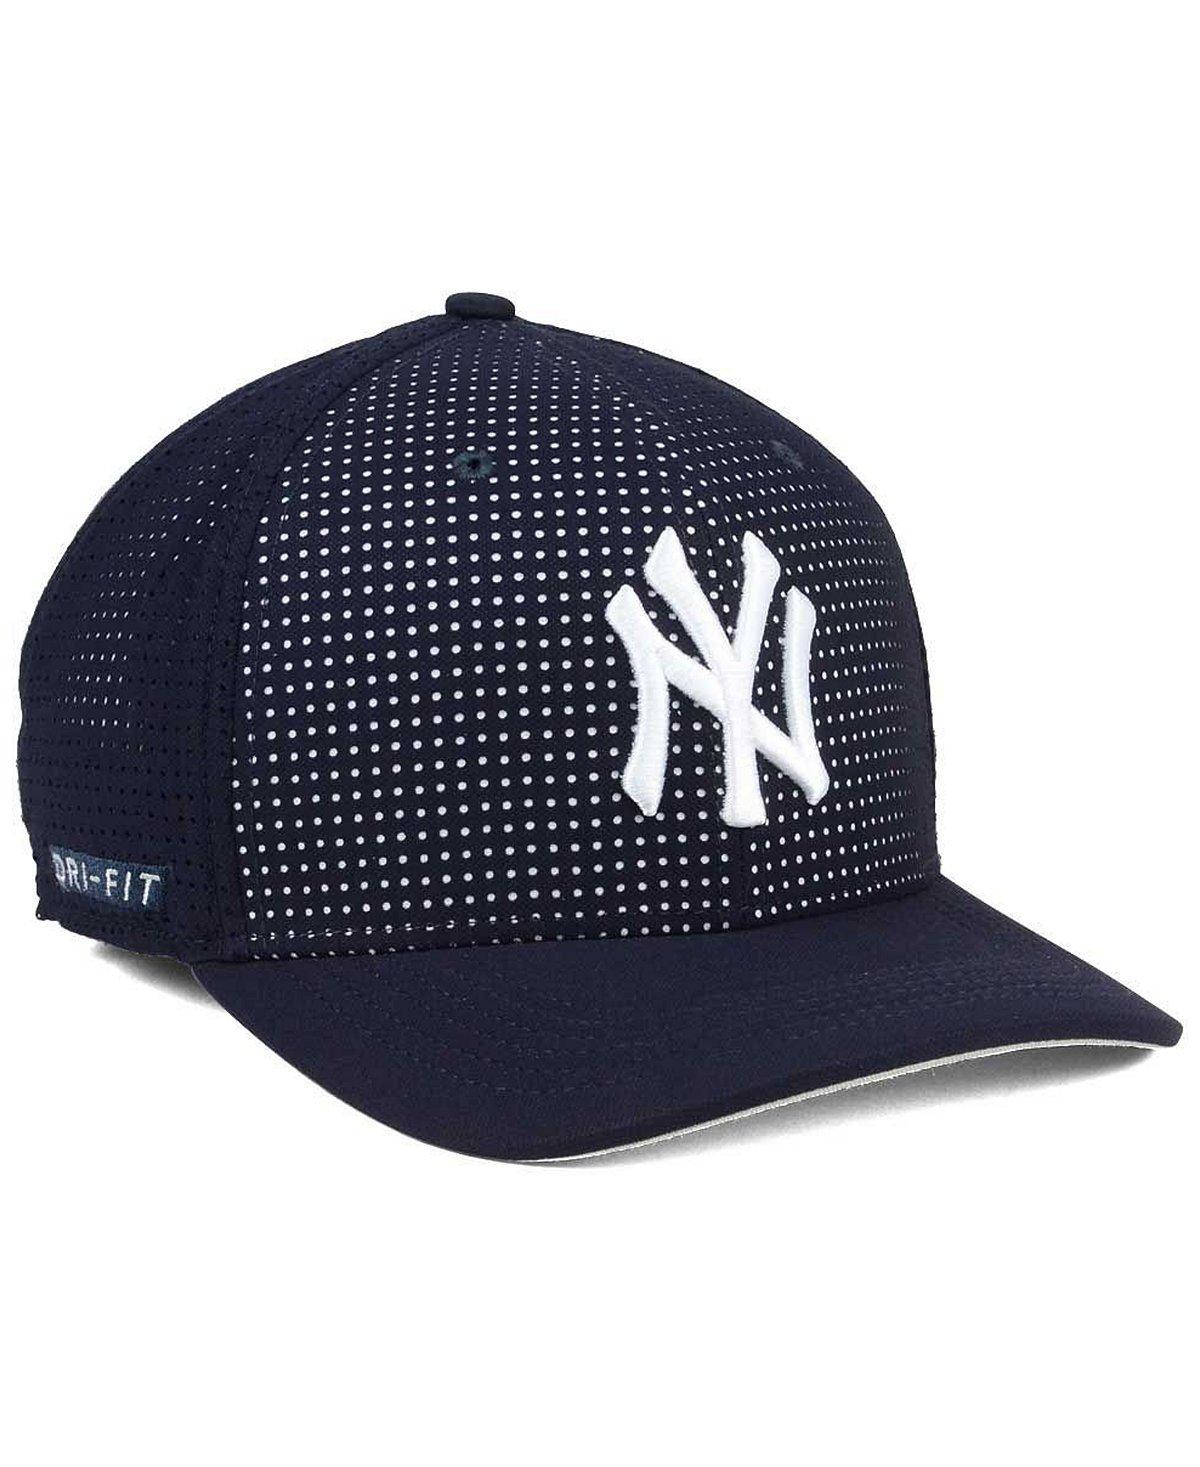 36a1655b84adf Nike New York Yankees MLB Vapor Cap: Amazon.co.uk: Sports & Outdoors